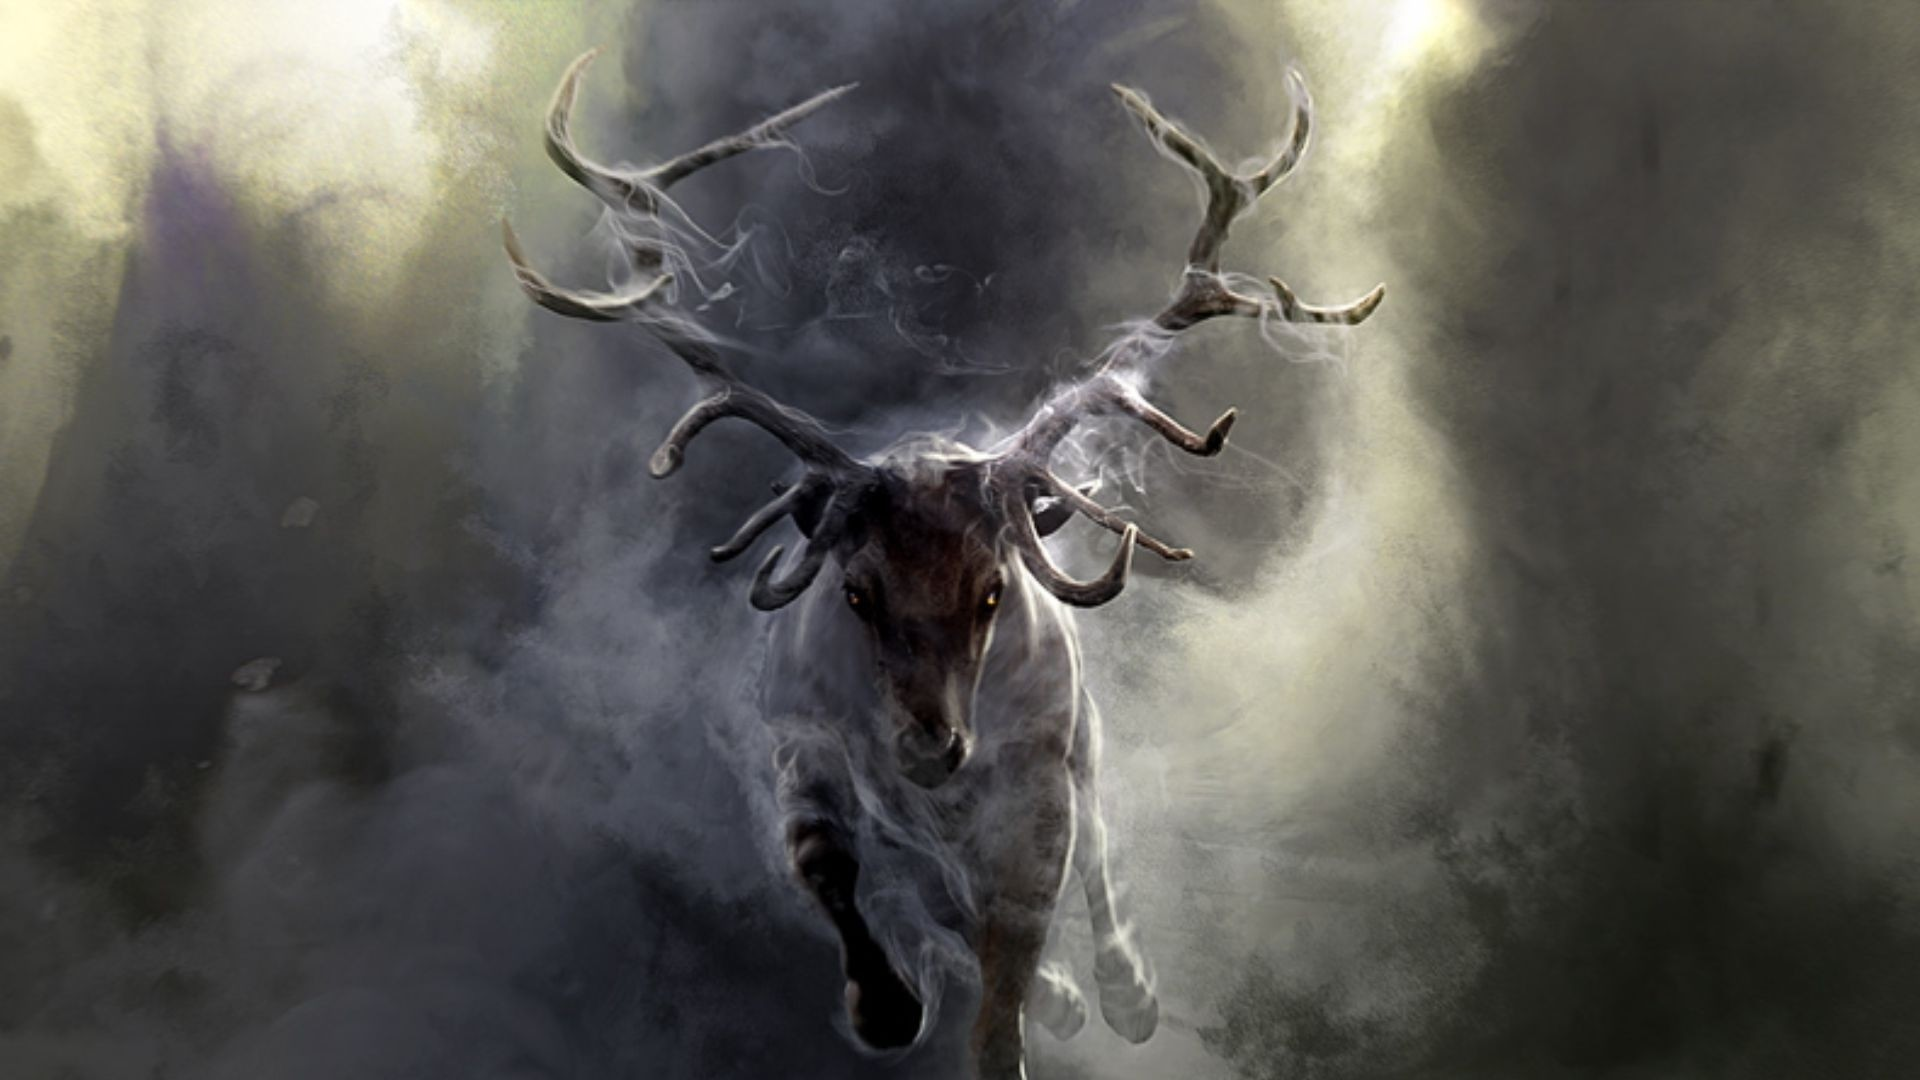 Res: 1920x1080, Deer HD Wallpapers Free Download